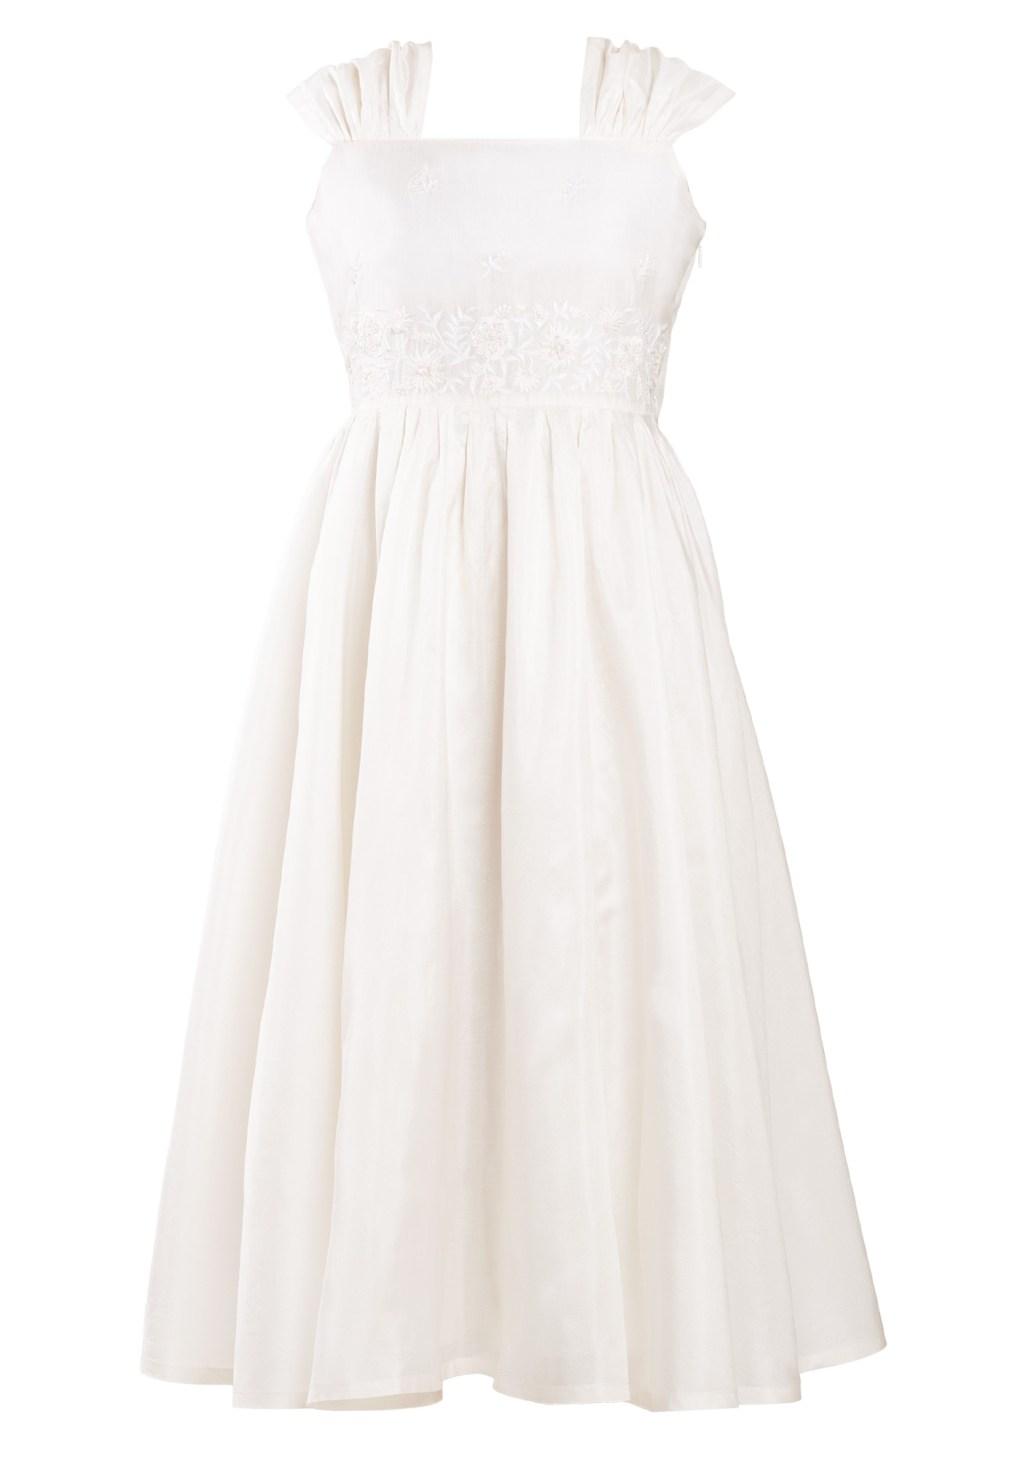 MINC Petite Summer Love Embroidered Girls Dress in White Silk